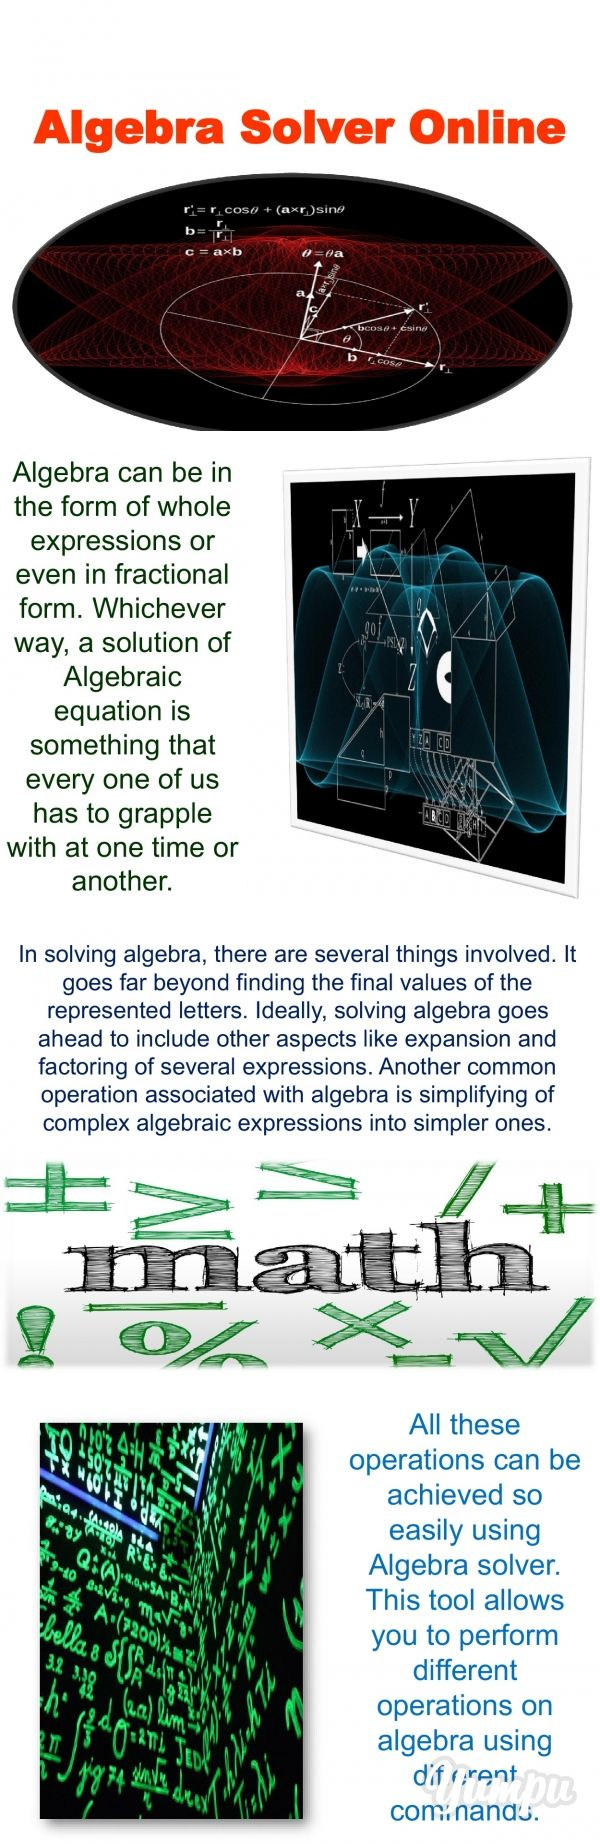 the best algebra solver ideas algebra help algebra solver online magazine 16 pages manipulation of algebraic equations has for long